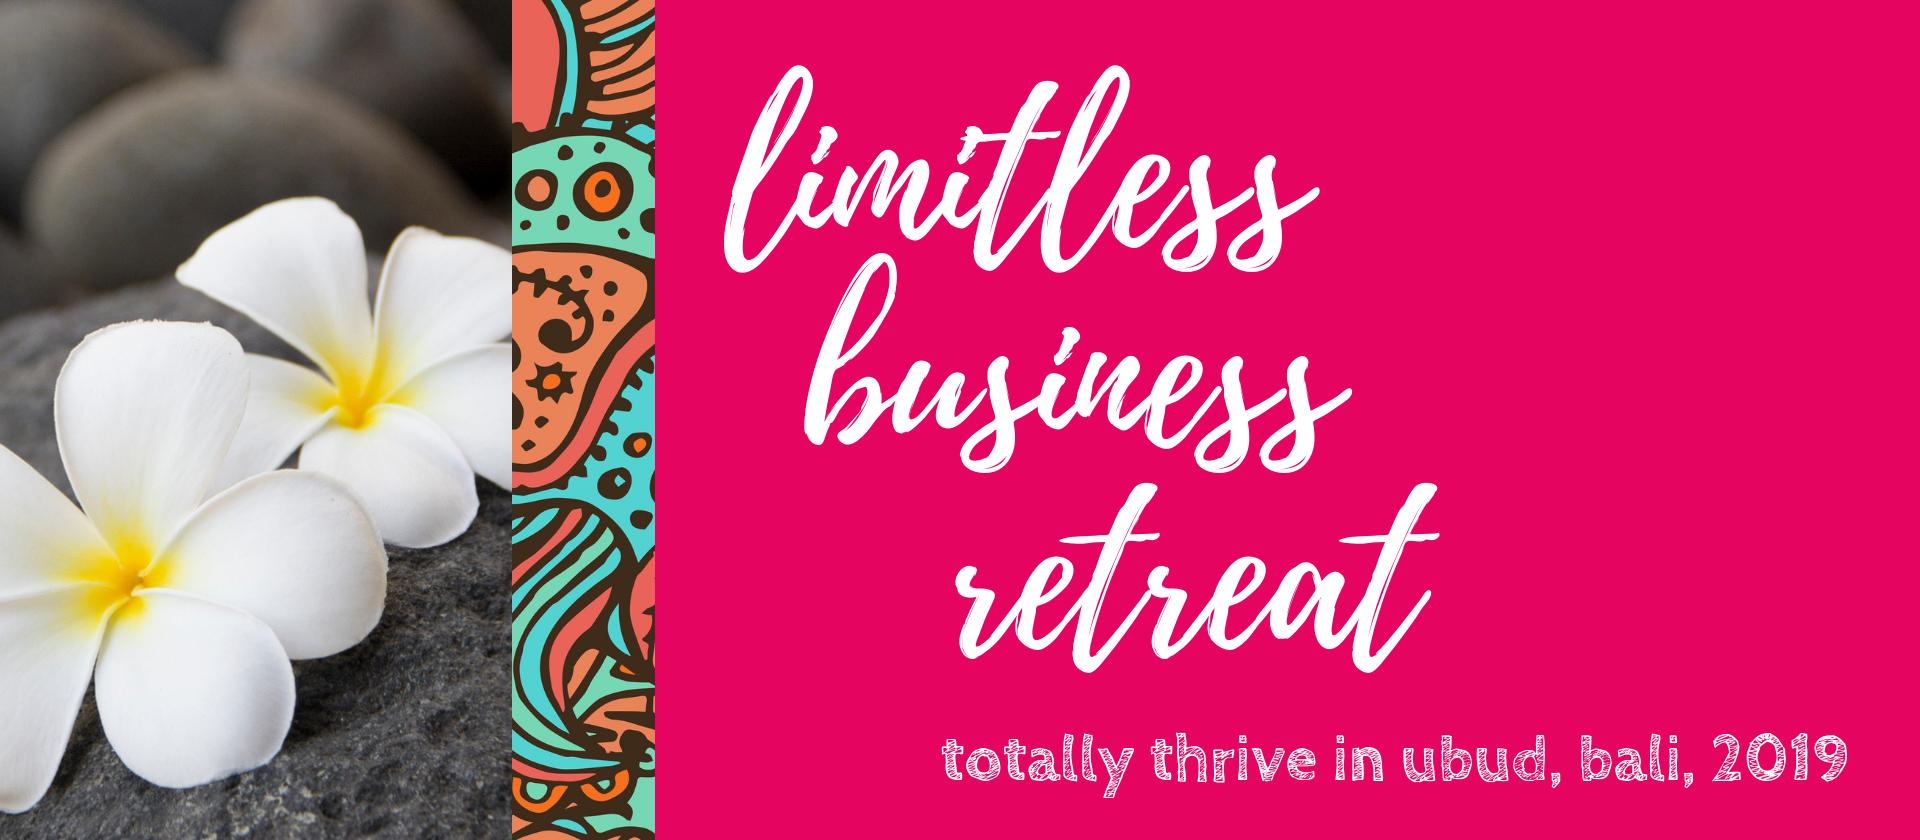 Shannon Bush | limitless business retreat for women Ubud Bali 2019